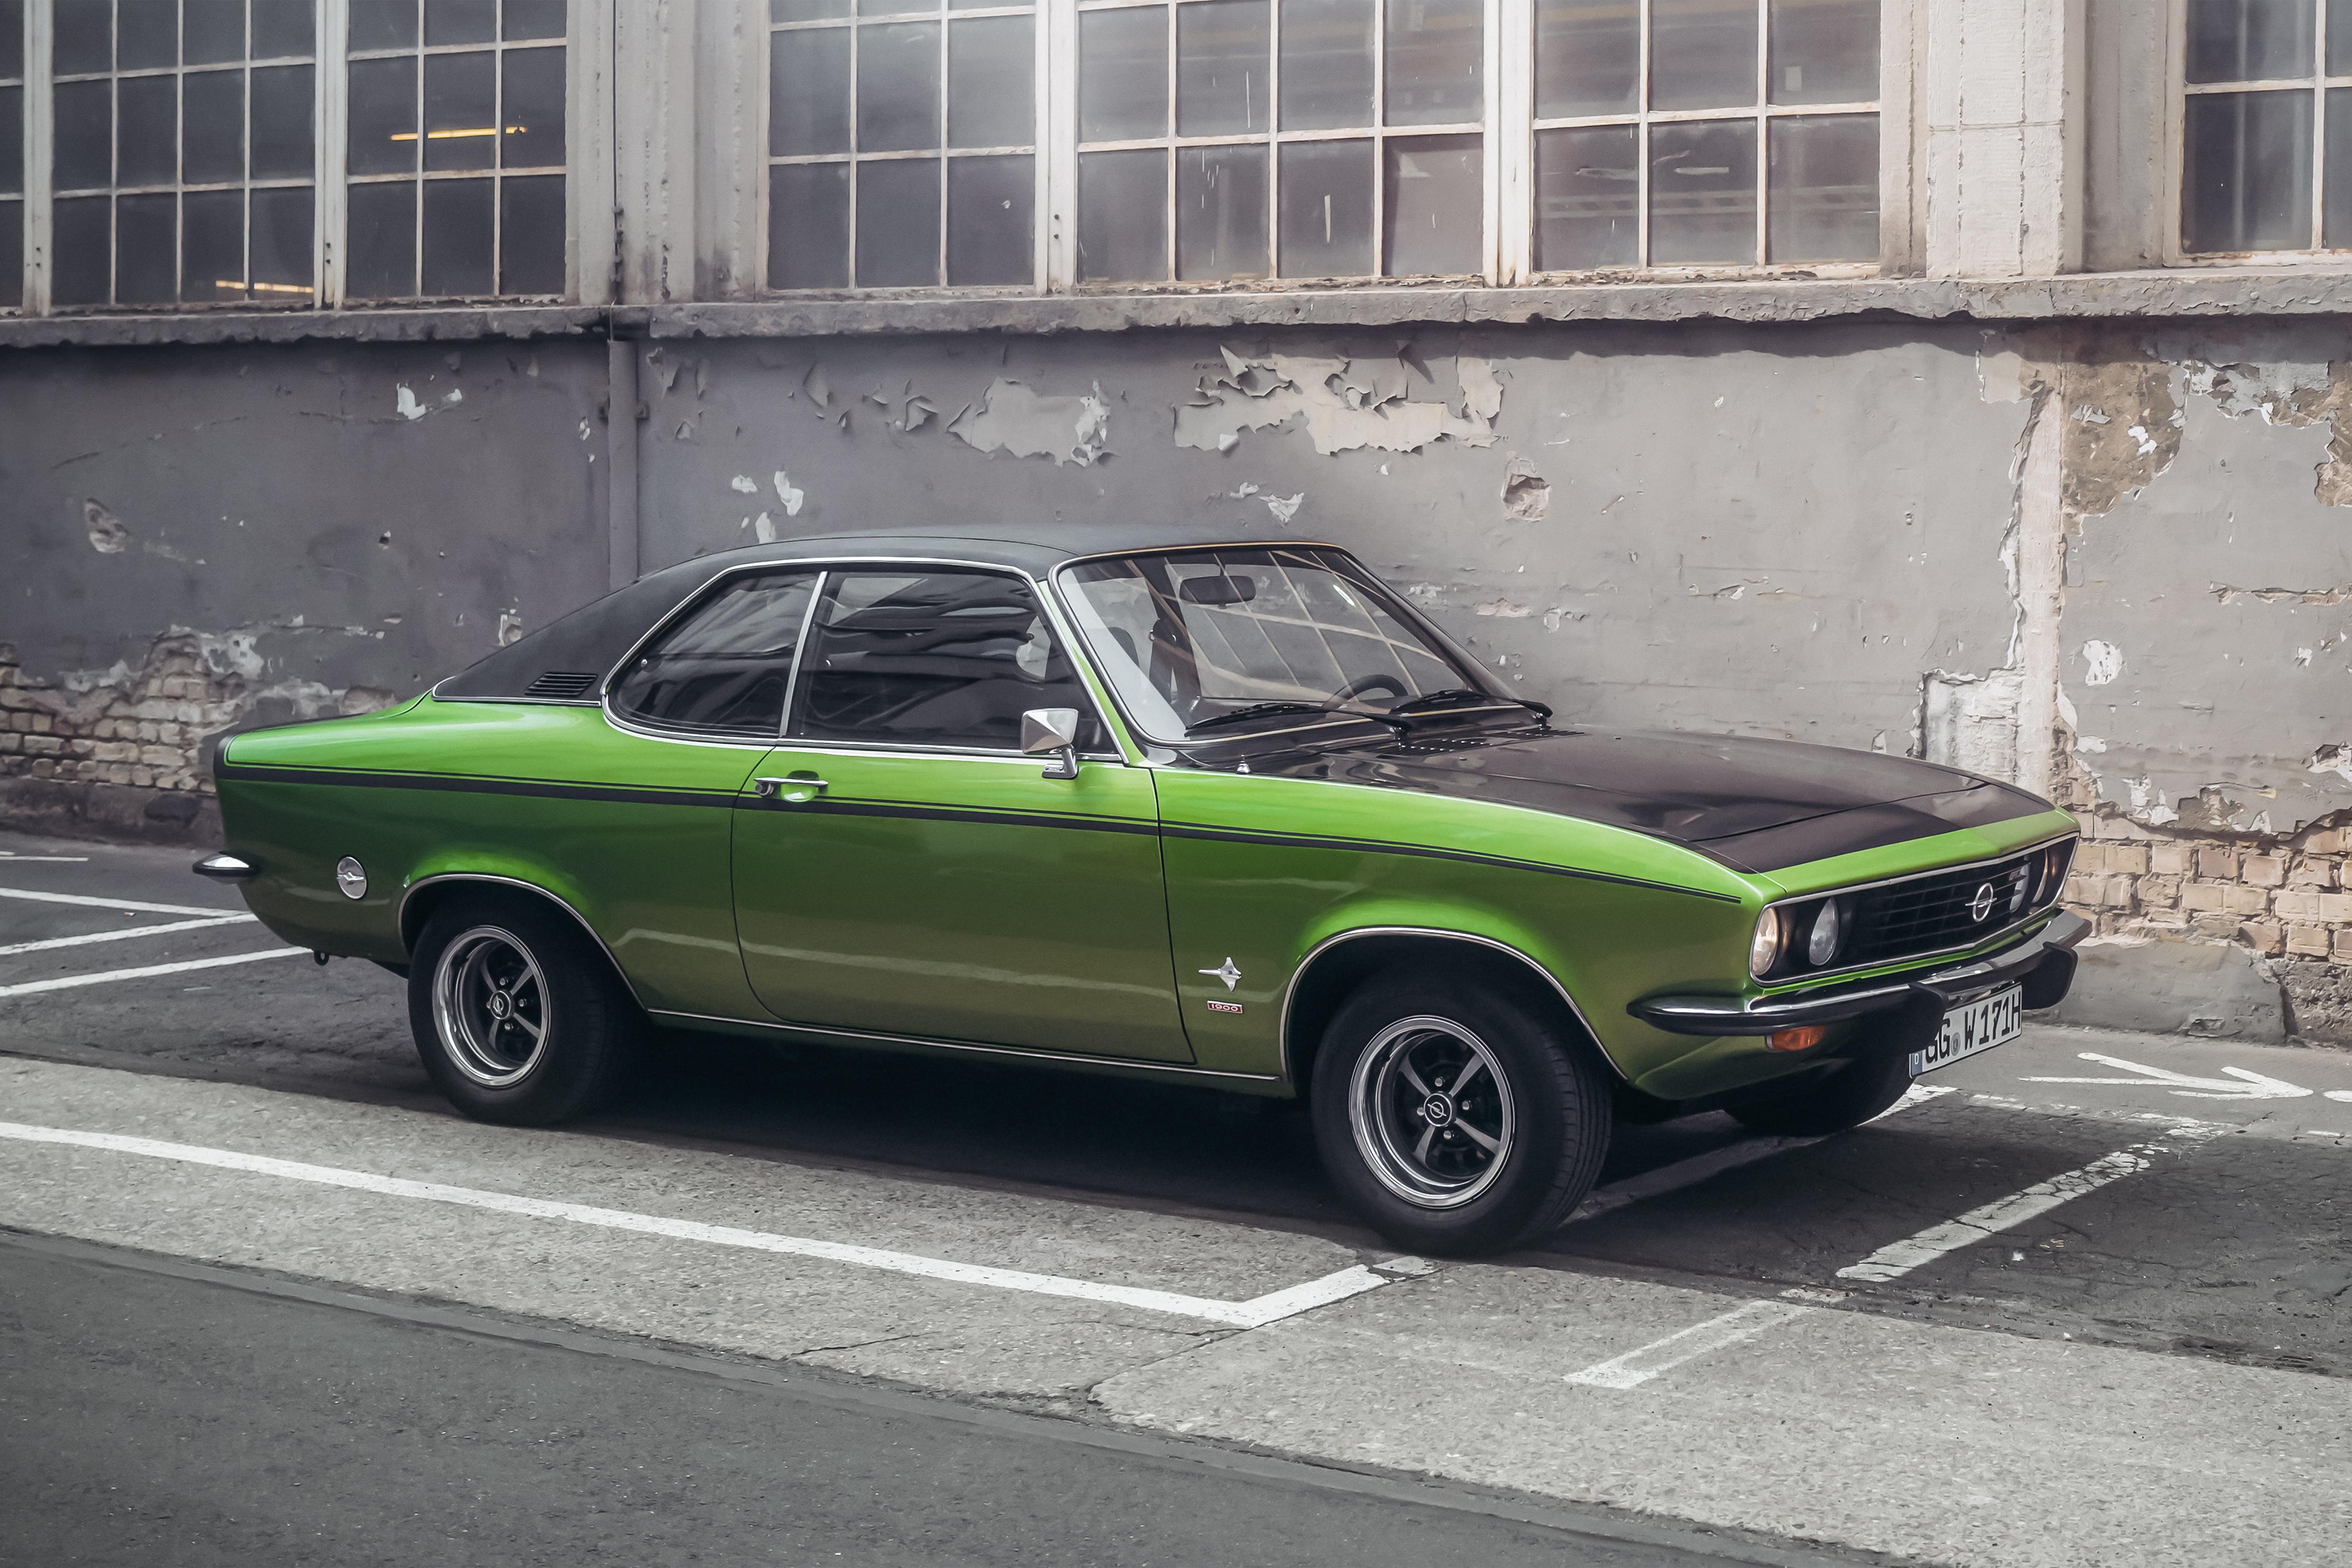 opel manta sr 1970 4k 1614632312 - Opel Manta SR 1970 4k - Opel Manta SR 1970 4k wallpapers